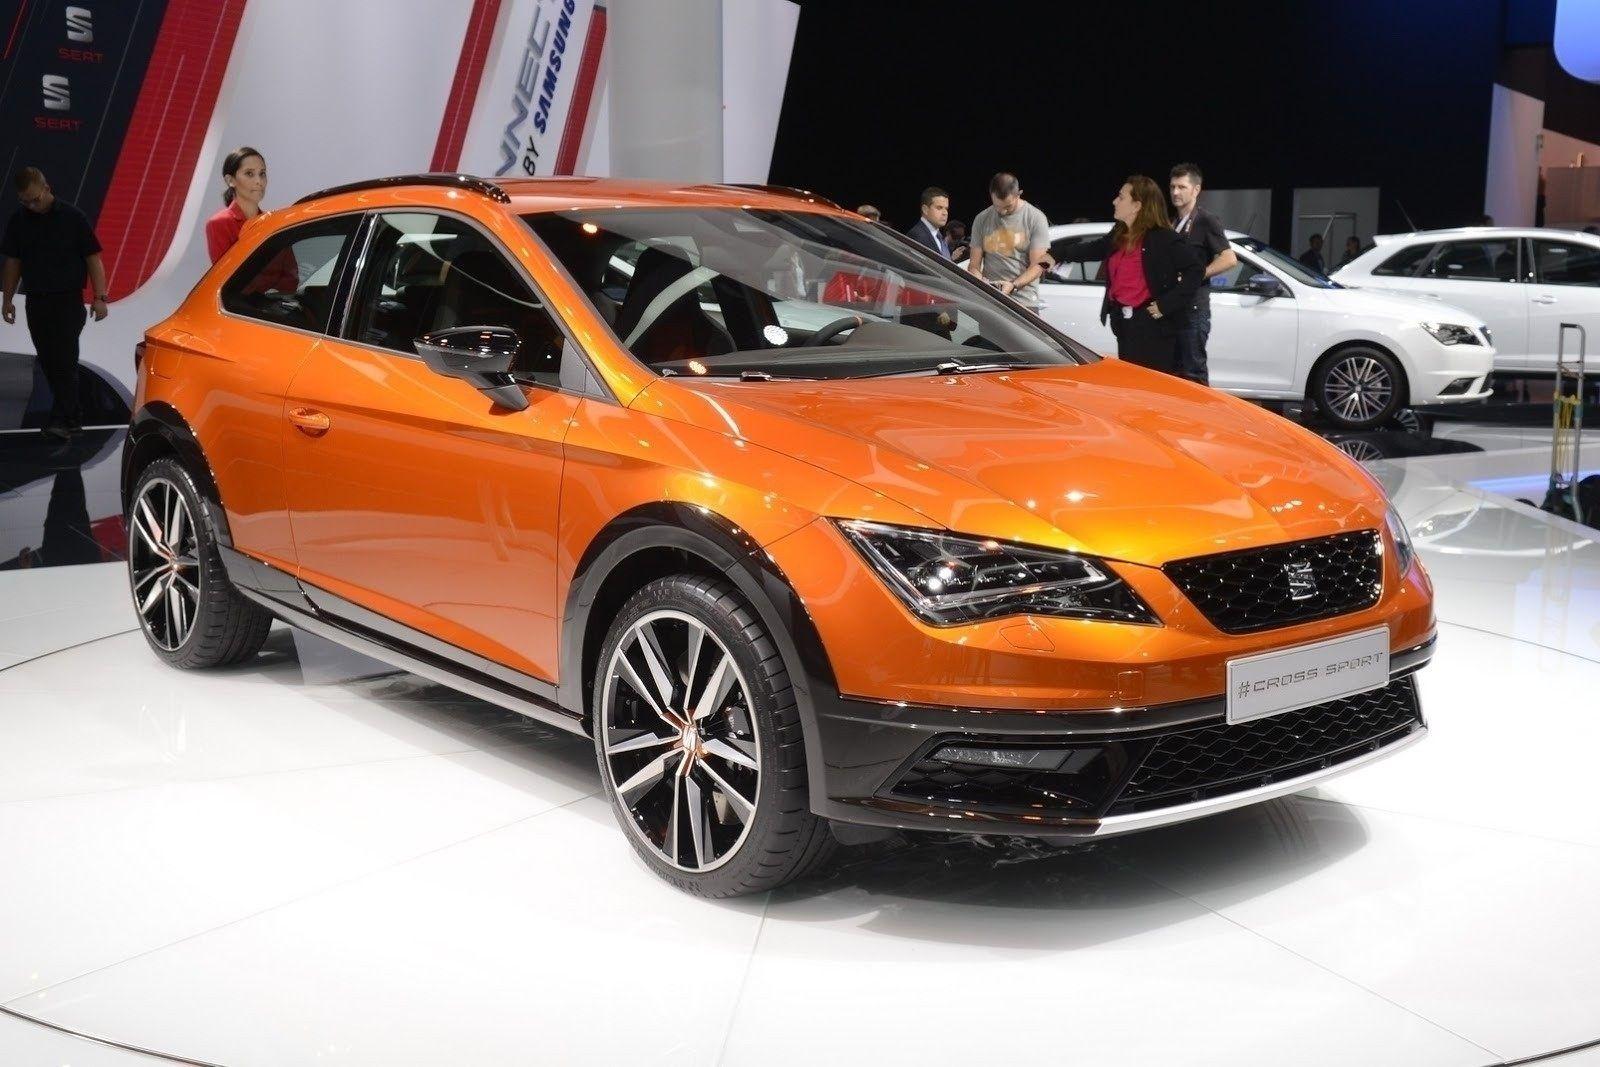 2019 Seat Leon X Perience New Review Seat leon, Suv, Car